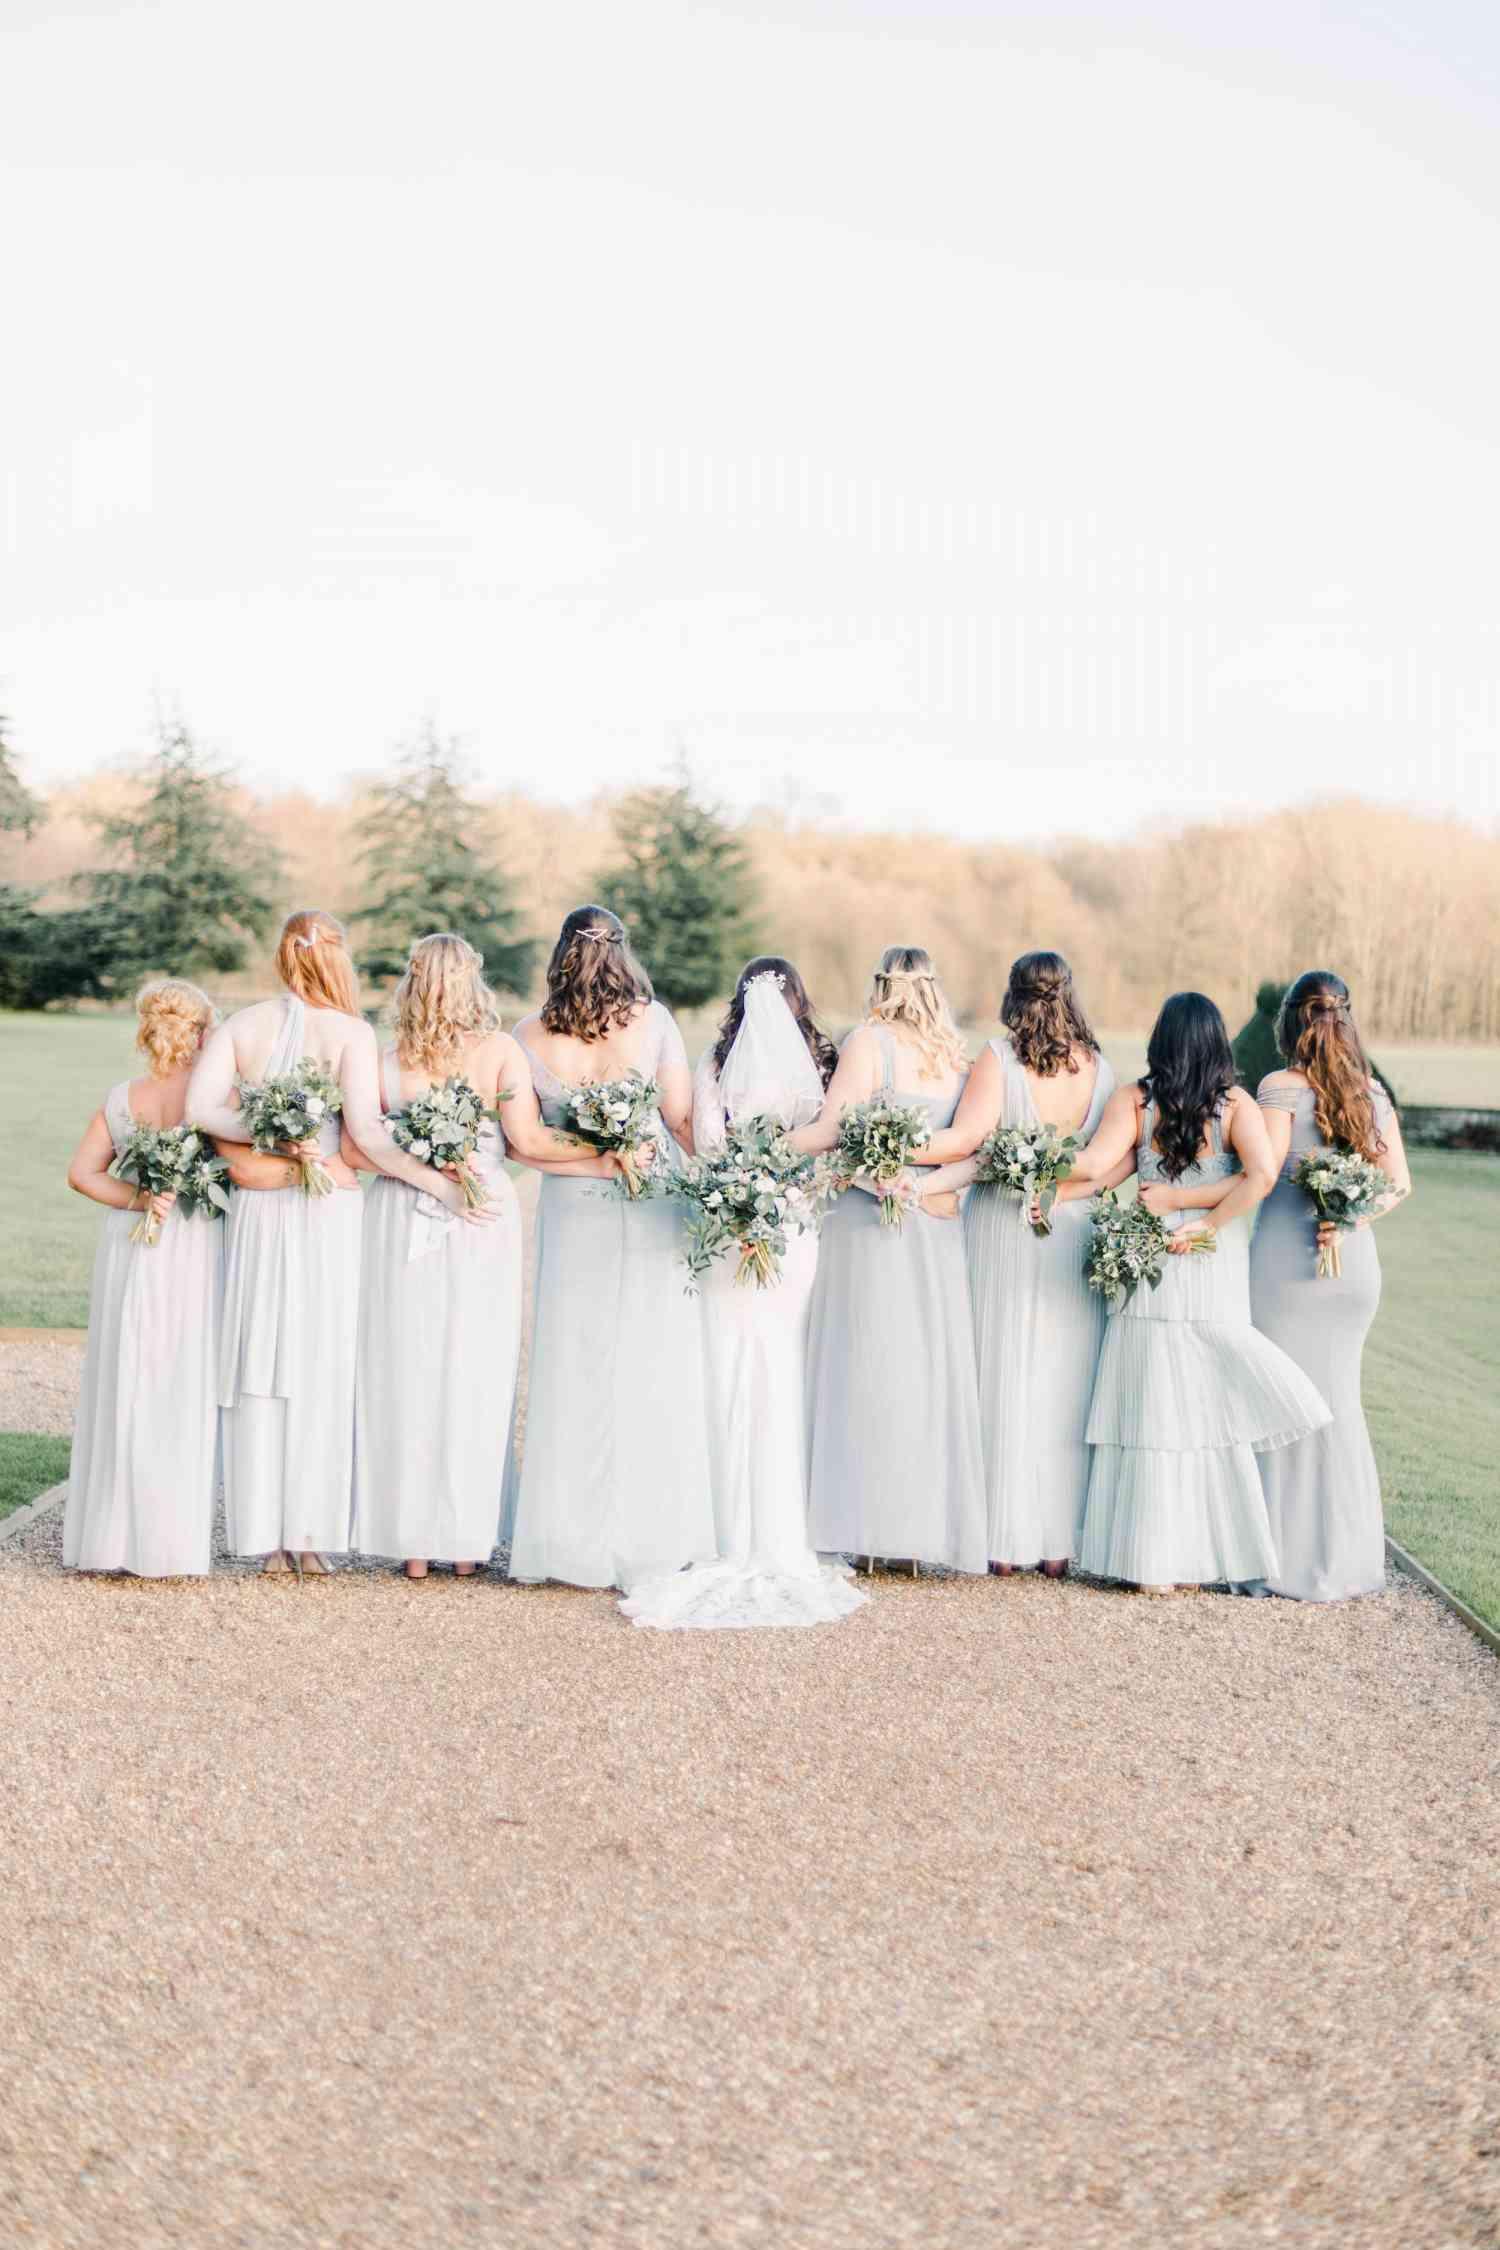 Brides and bridesmaides